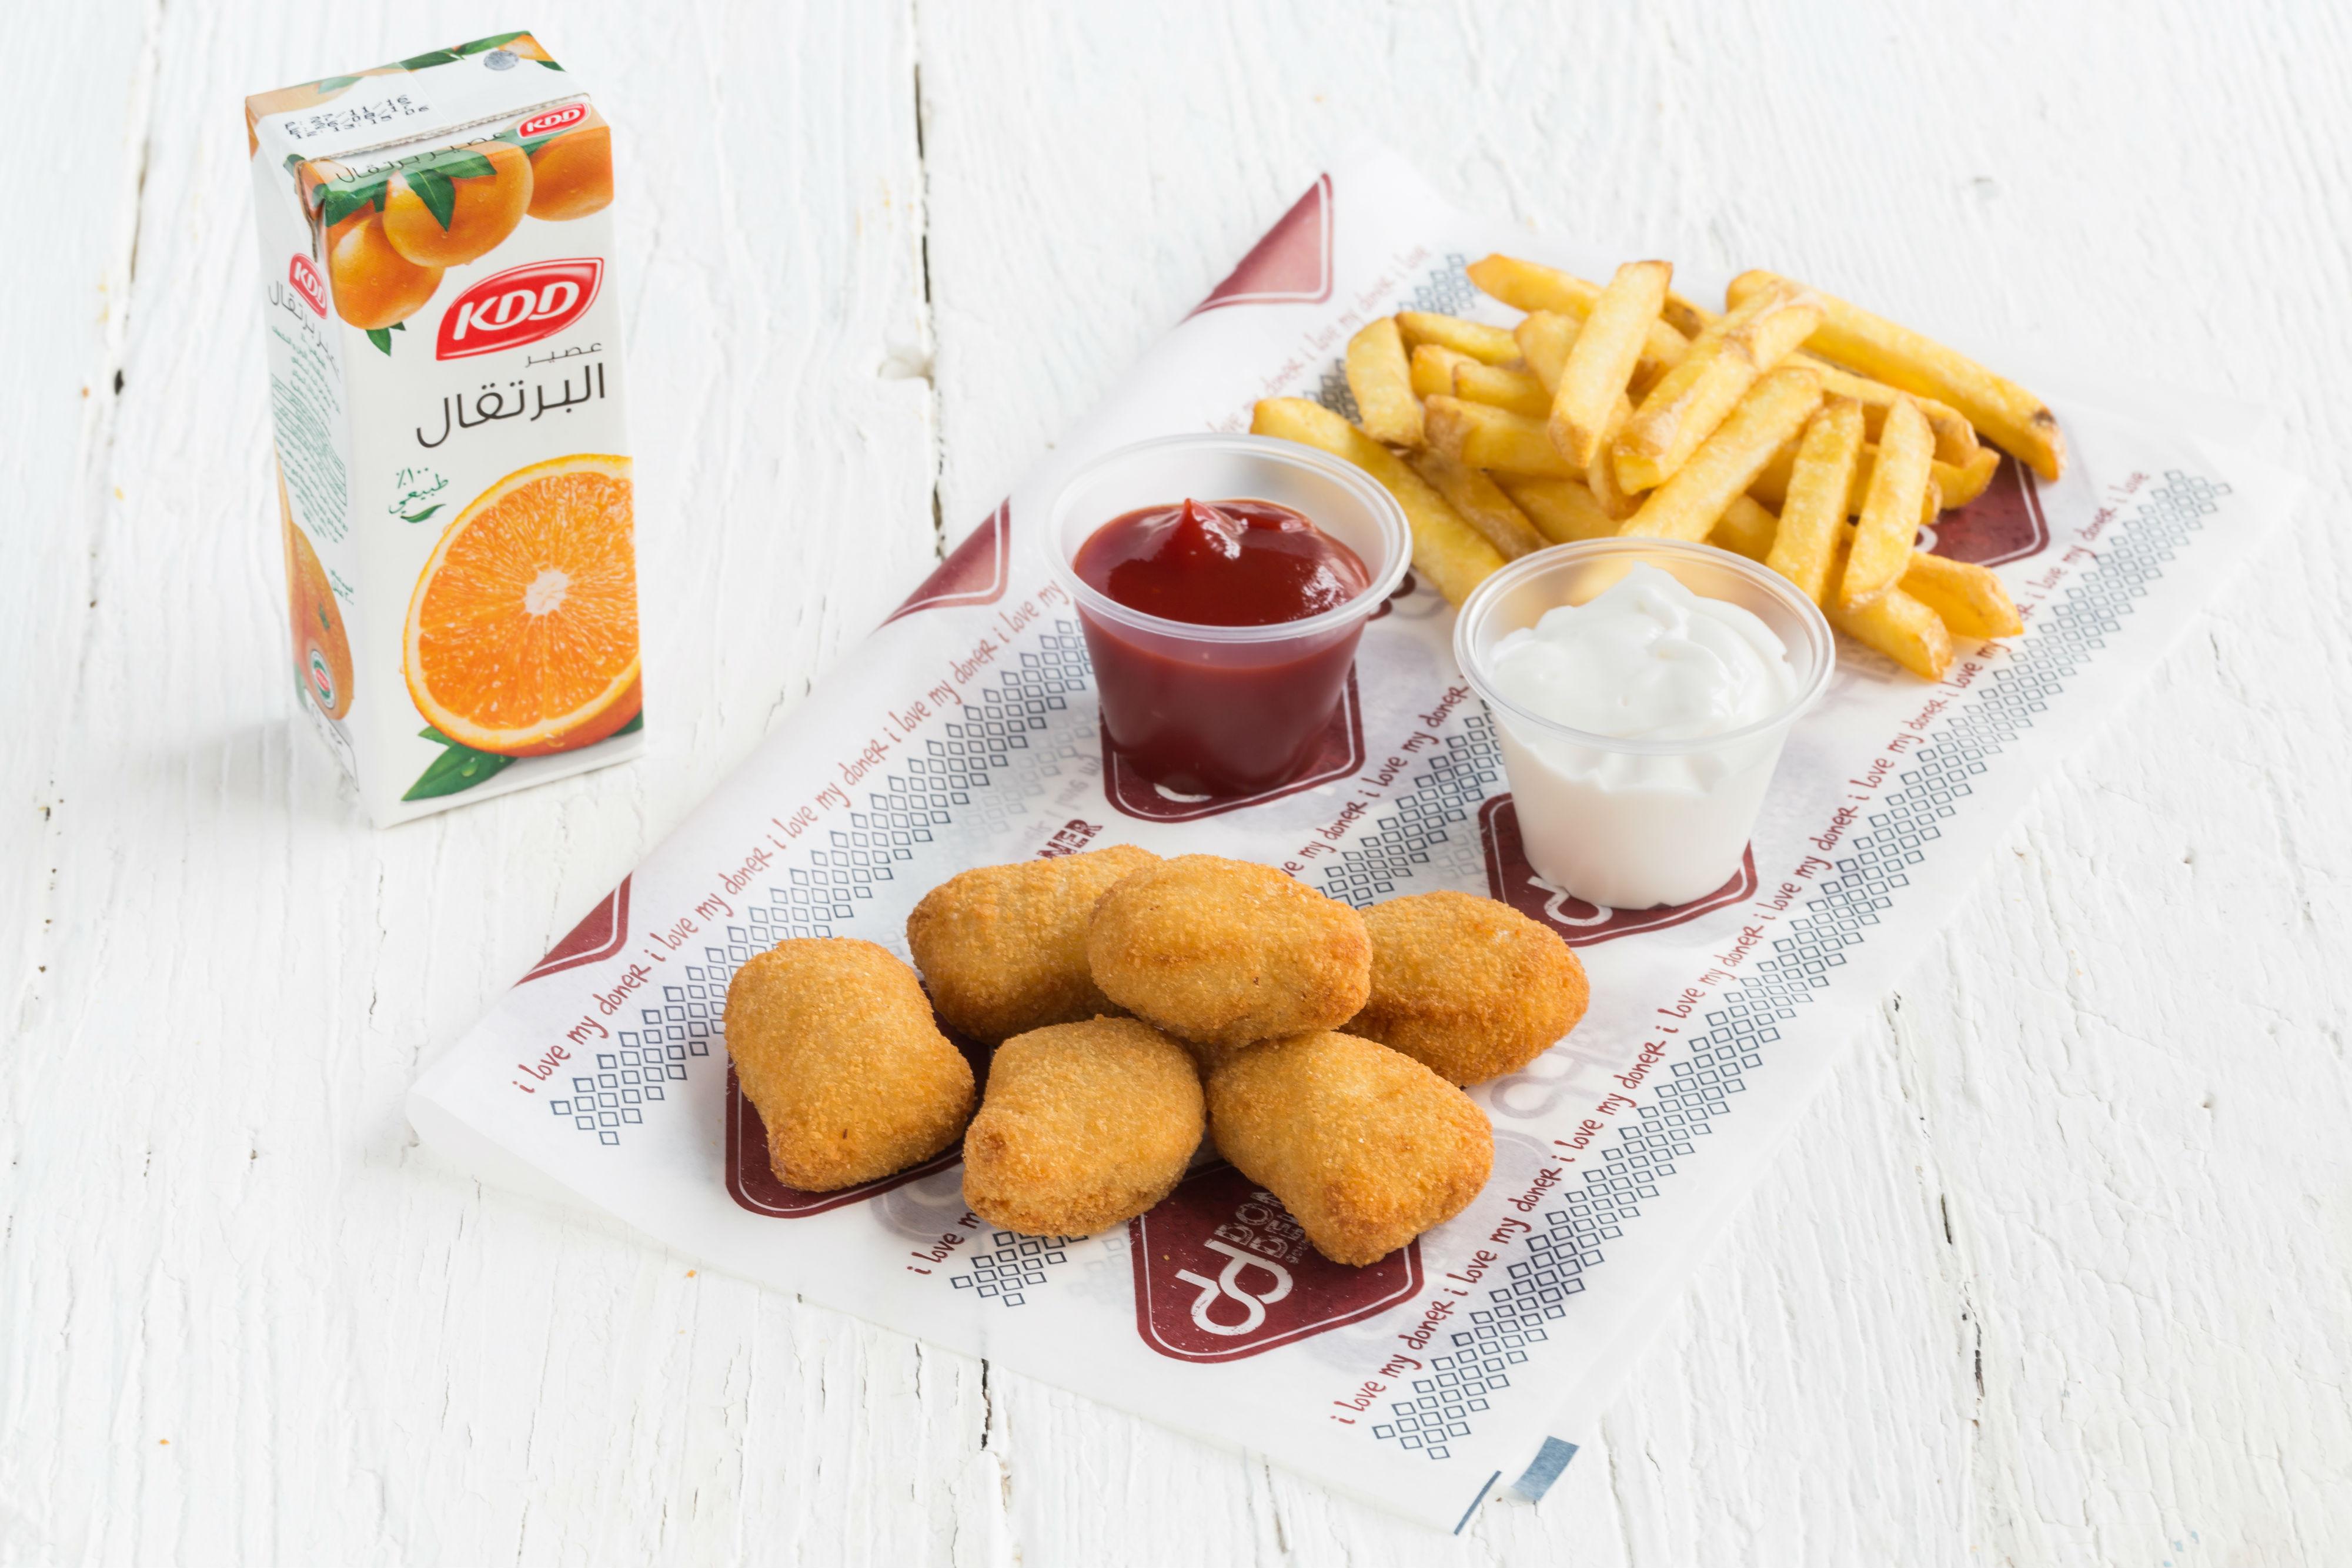 Kids Nuggets Meal (4 Pcs)